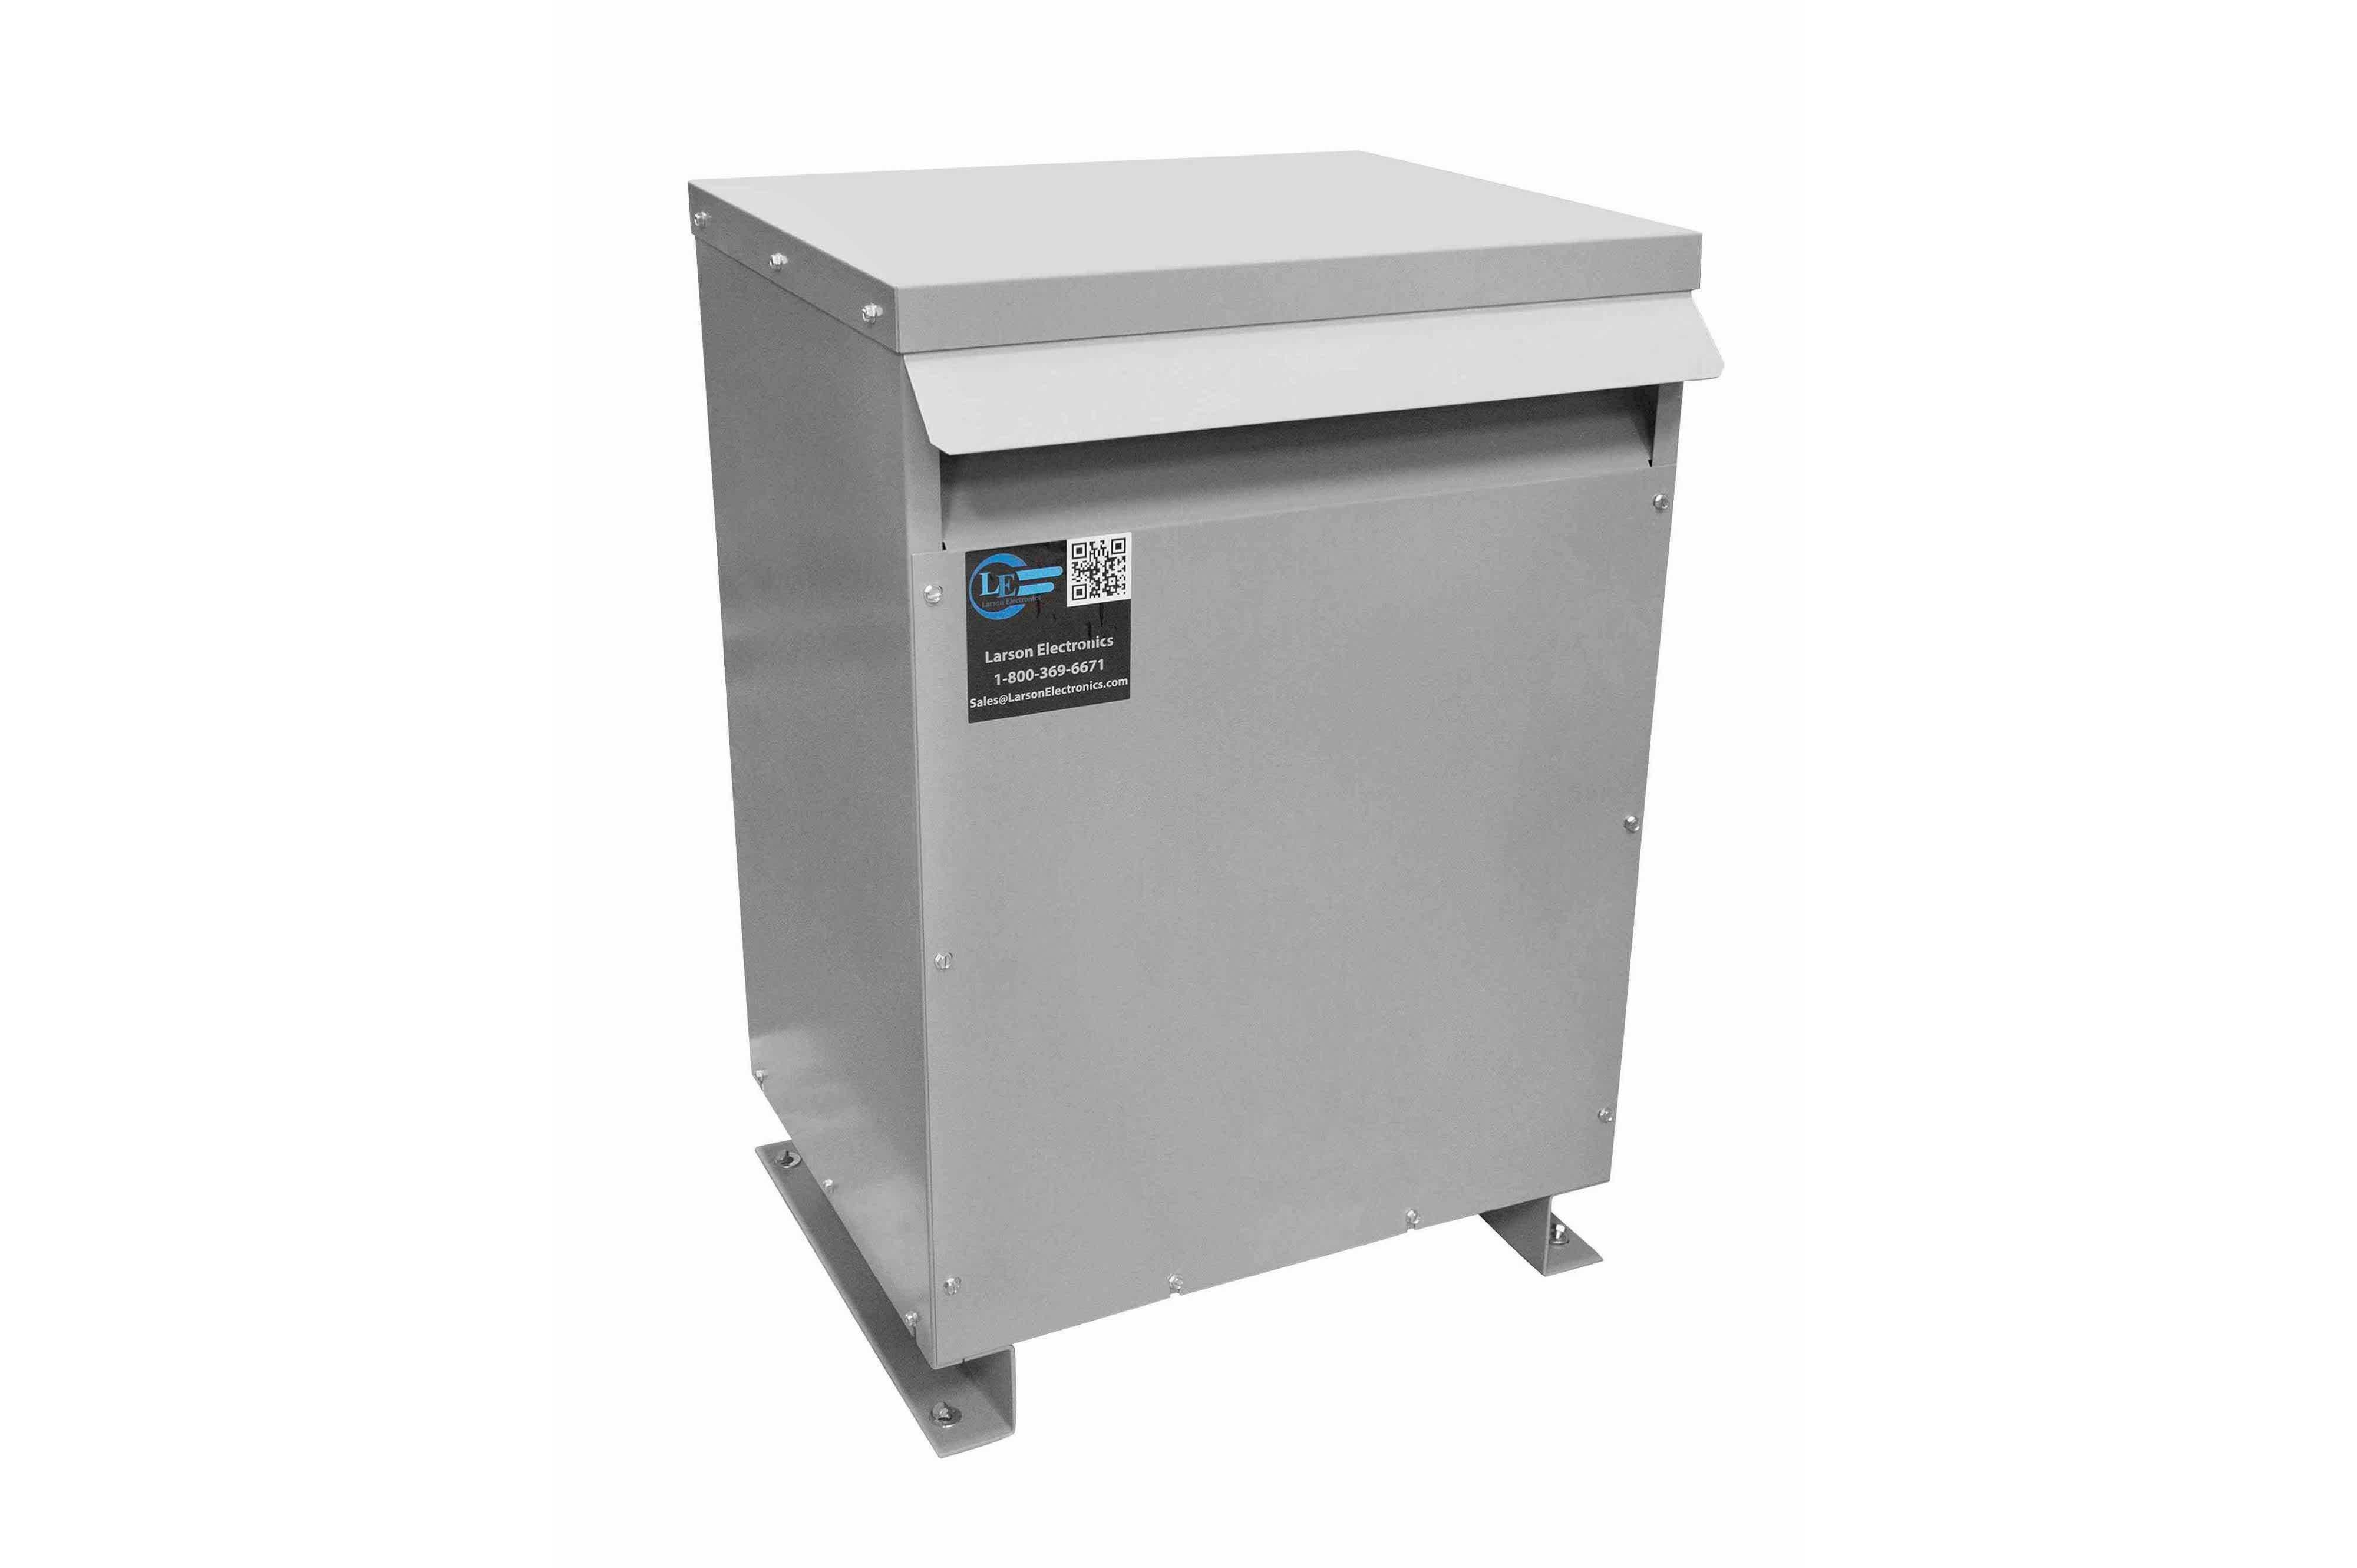 300 kVA 3PH Isolation Transformer, 440V Wye Primary, 208V Delta Secondary, N3R, Ventilated, 60 Hz